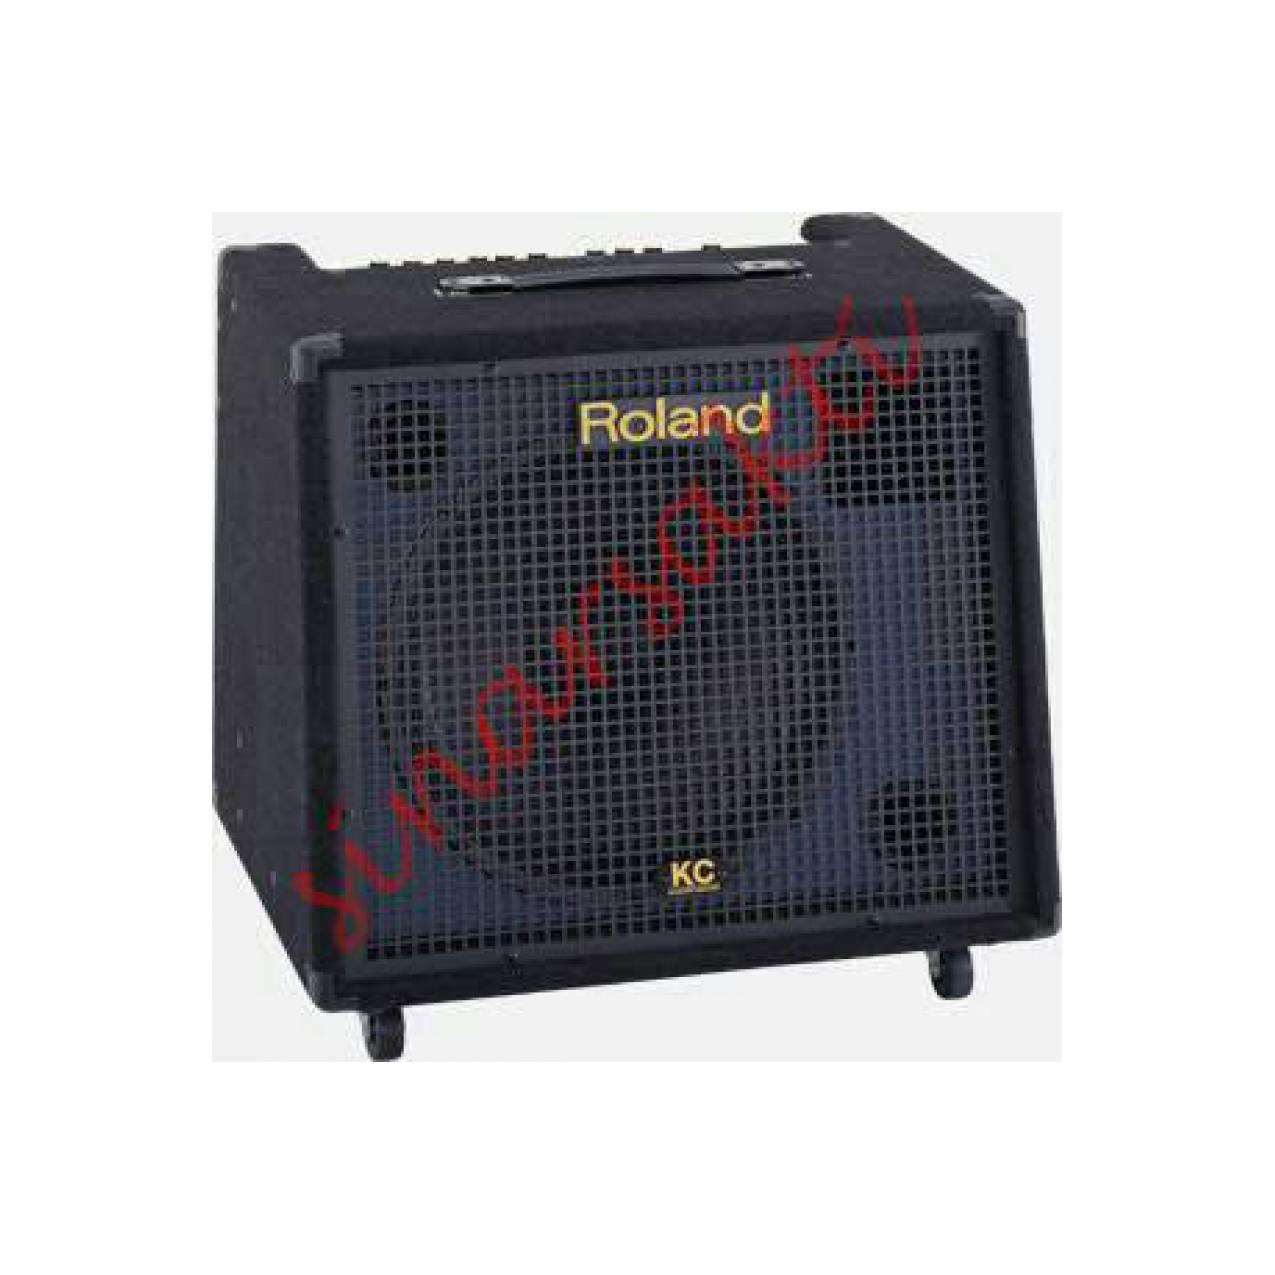 Ampli Keyboard Roland KC 550 ( 15 inch ) ORIGINAL